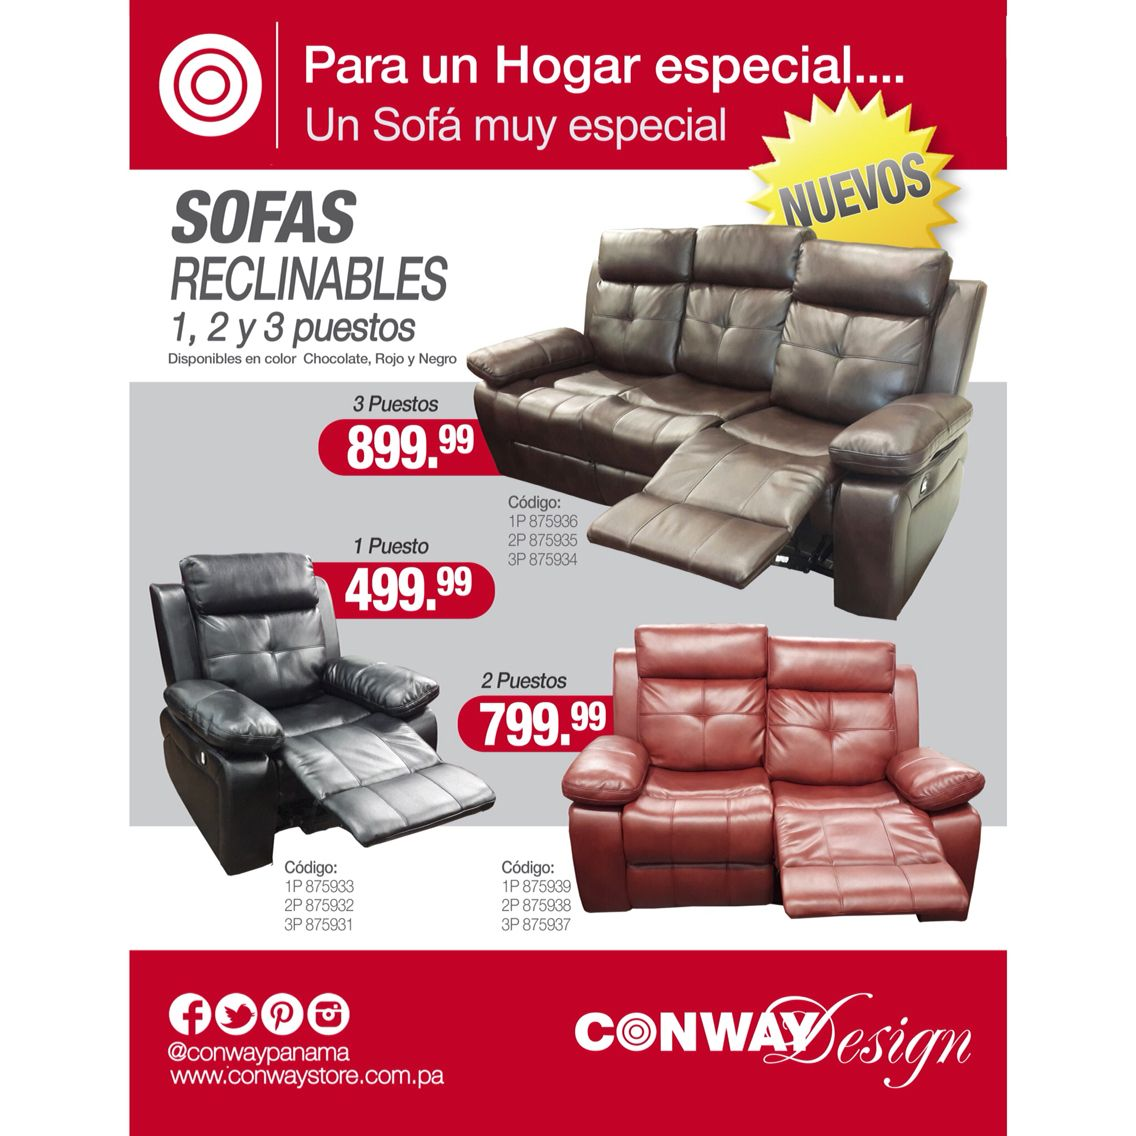 Hogar Muebles Furniture Panama Conwaydesign Conway Design  # Royal Door Muebles